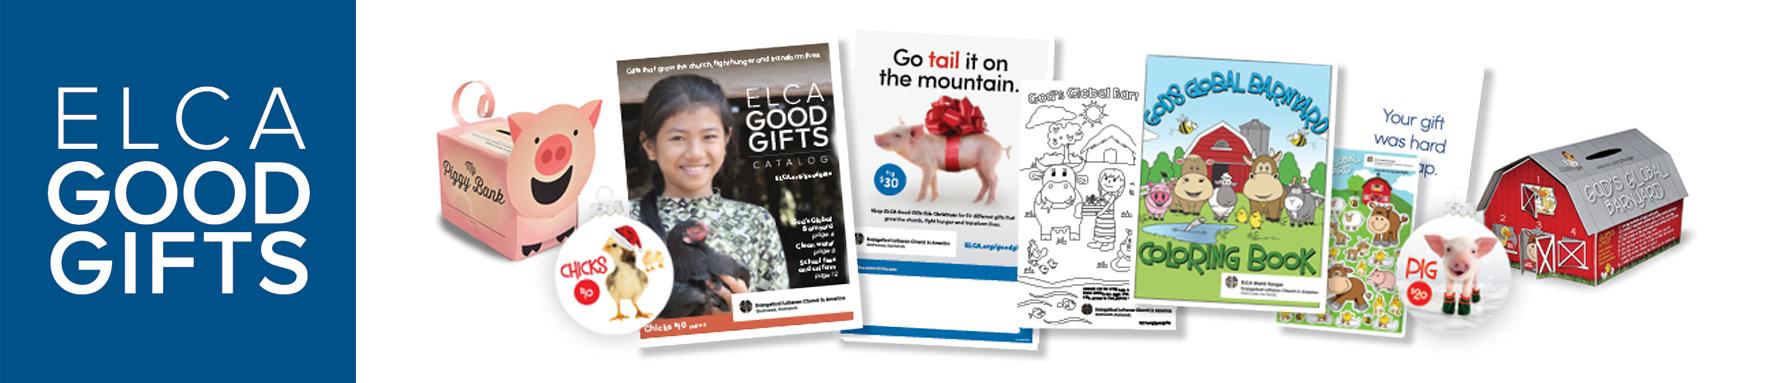 ELCA Good Gifts